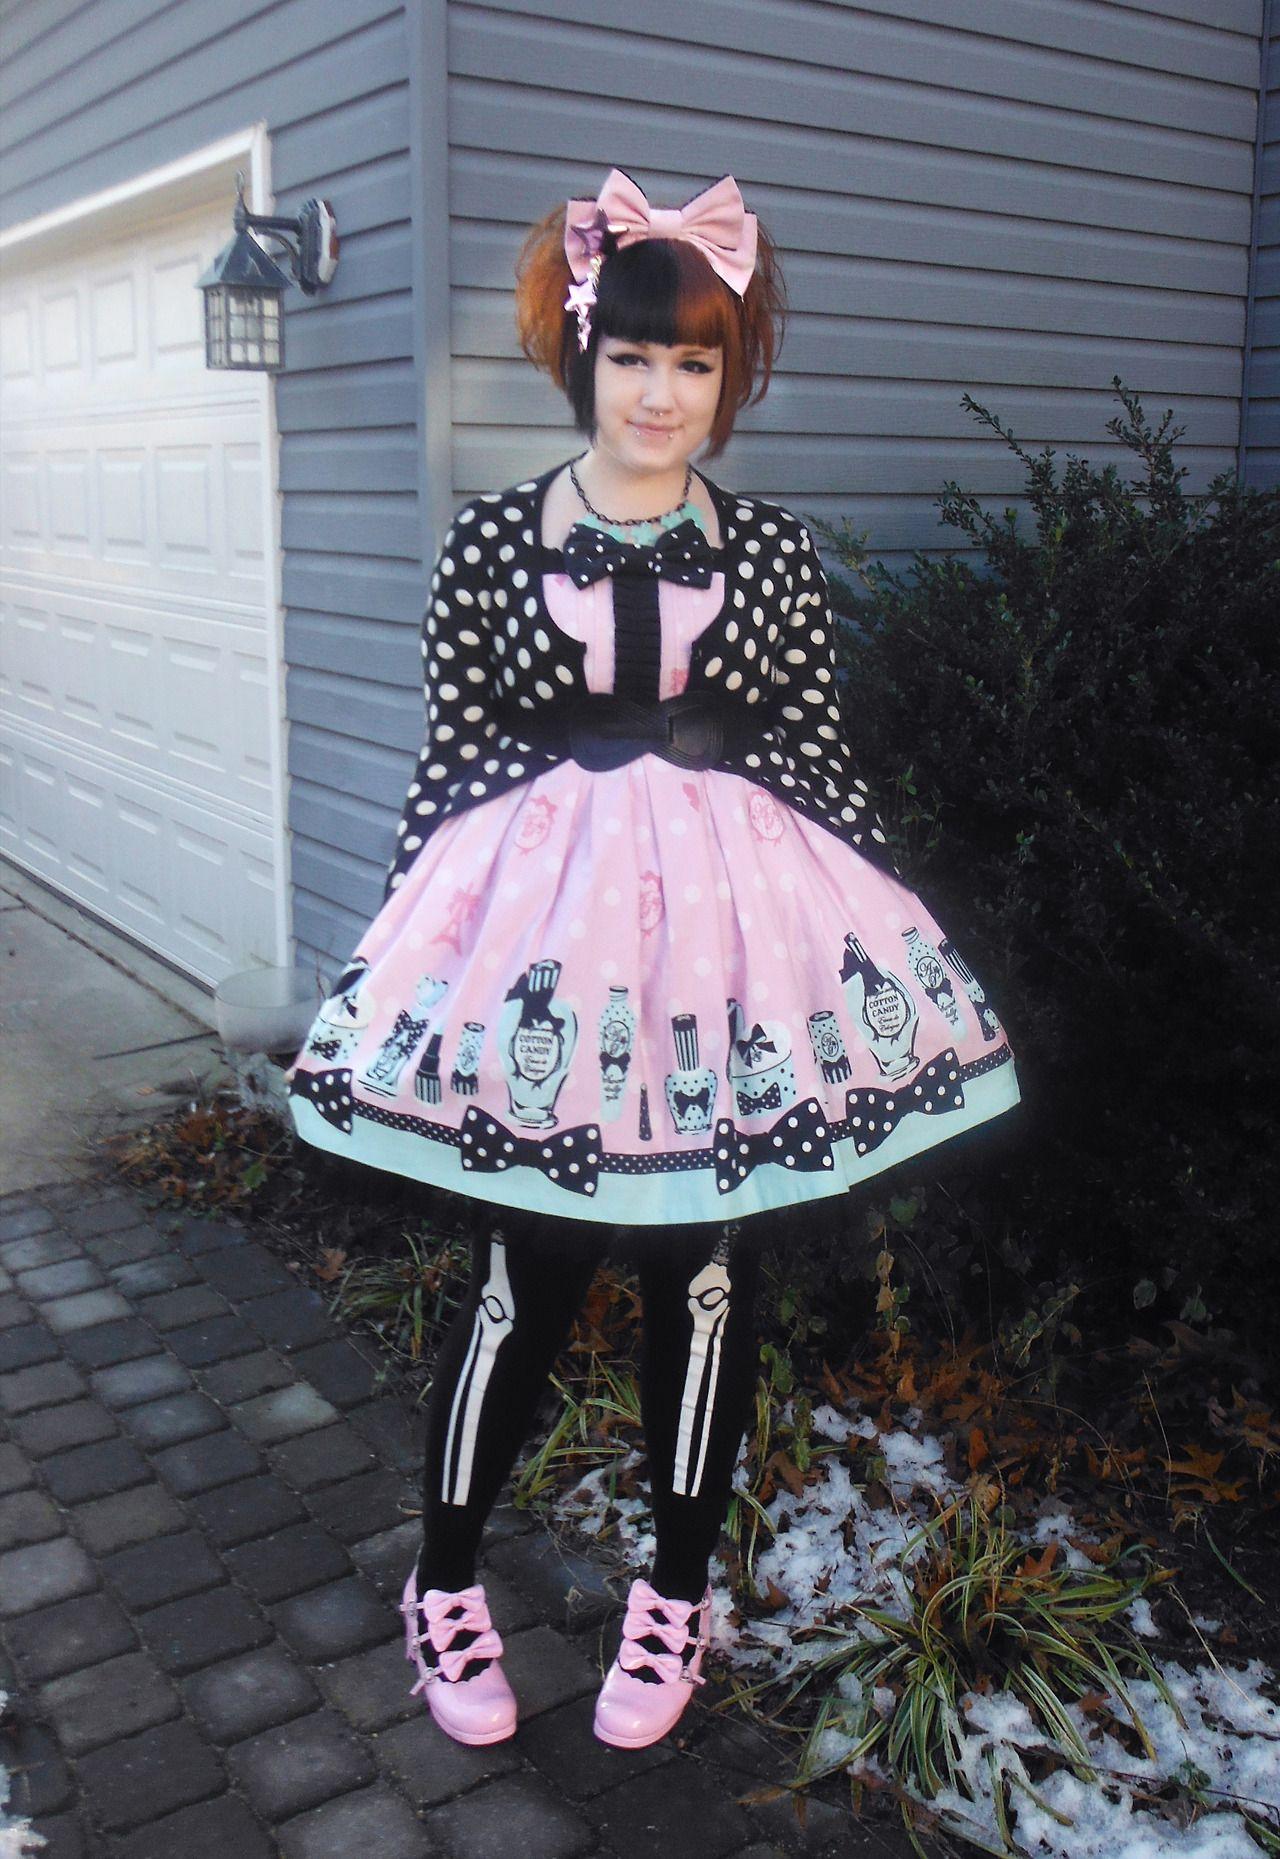 Frilly Sissy Tumblr for creepy cute   tumblr   my style - creepy cute   pinterest   creepy